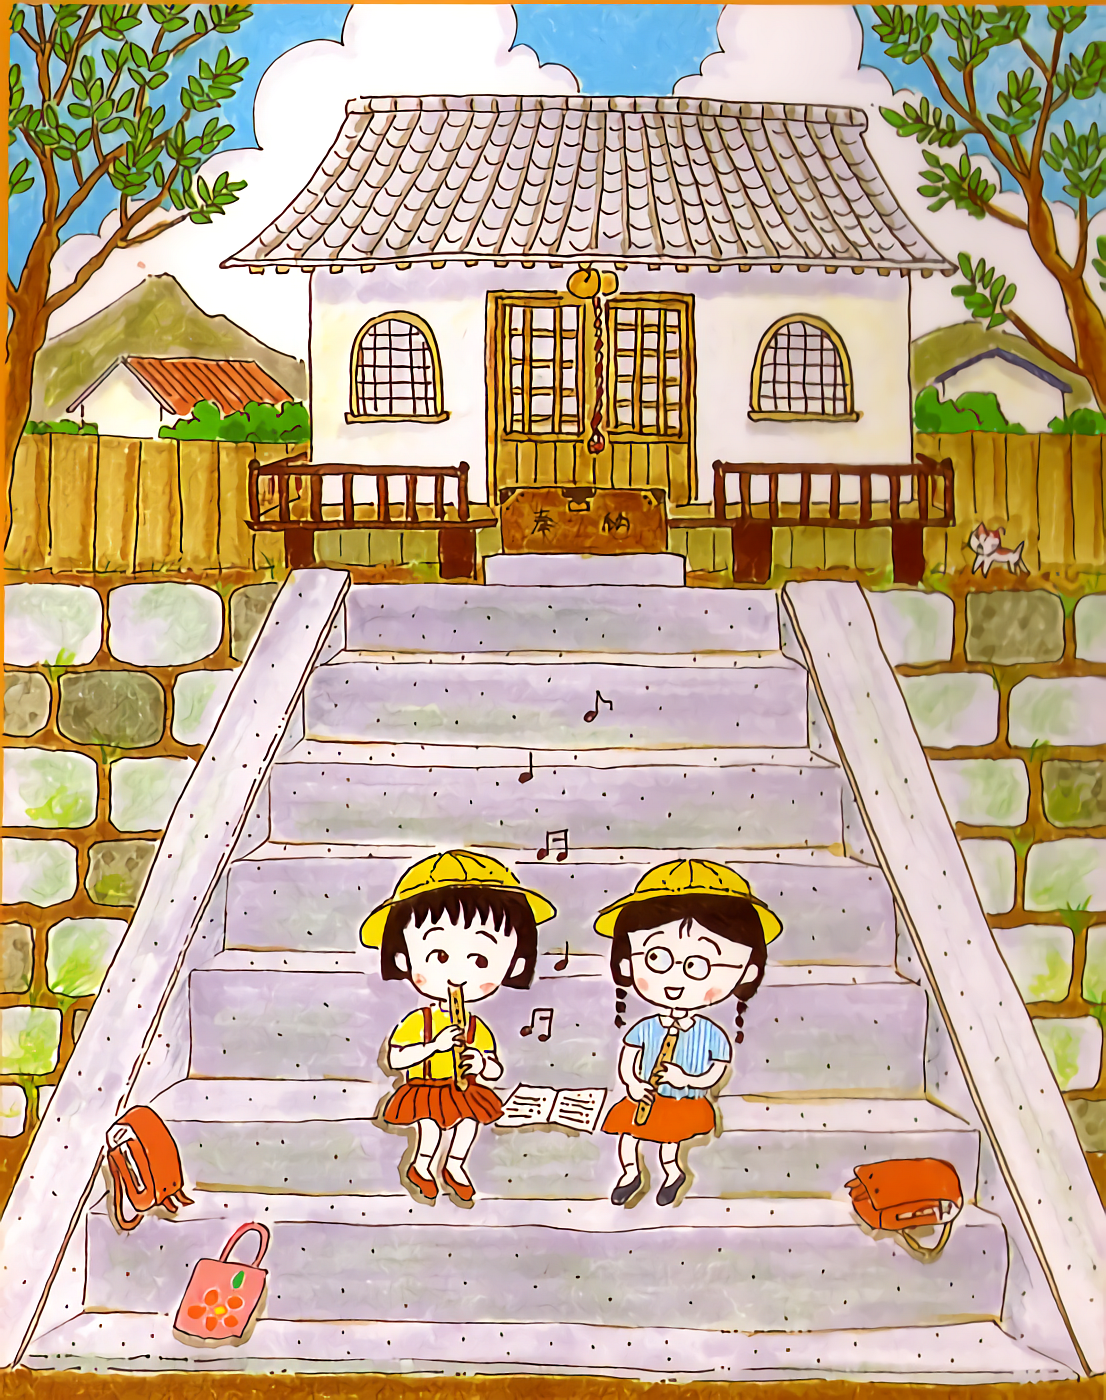 Chibi Maruko Chan 배경화면, 그림, 아트 드로잉